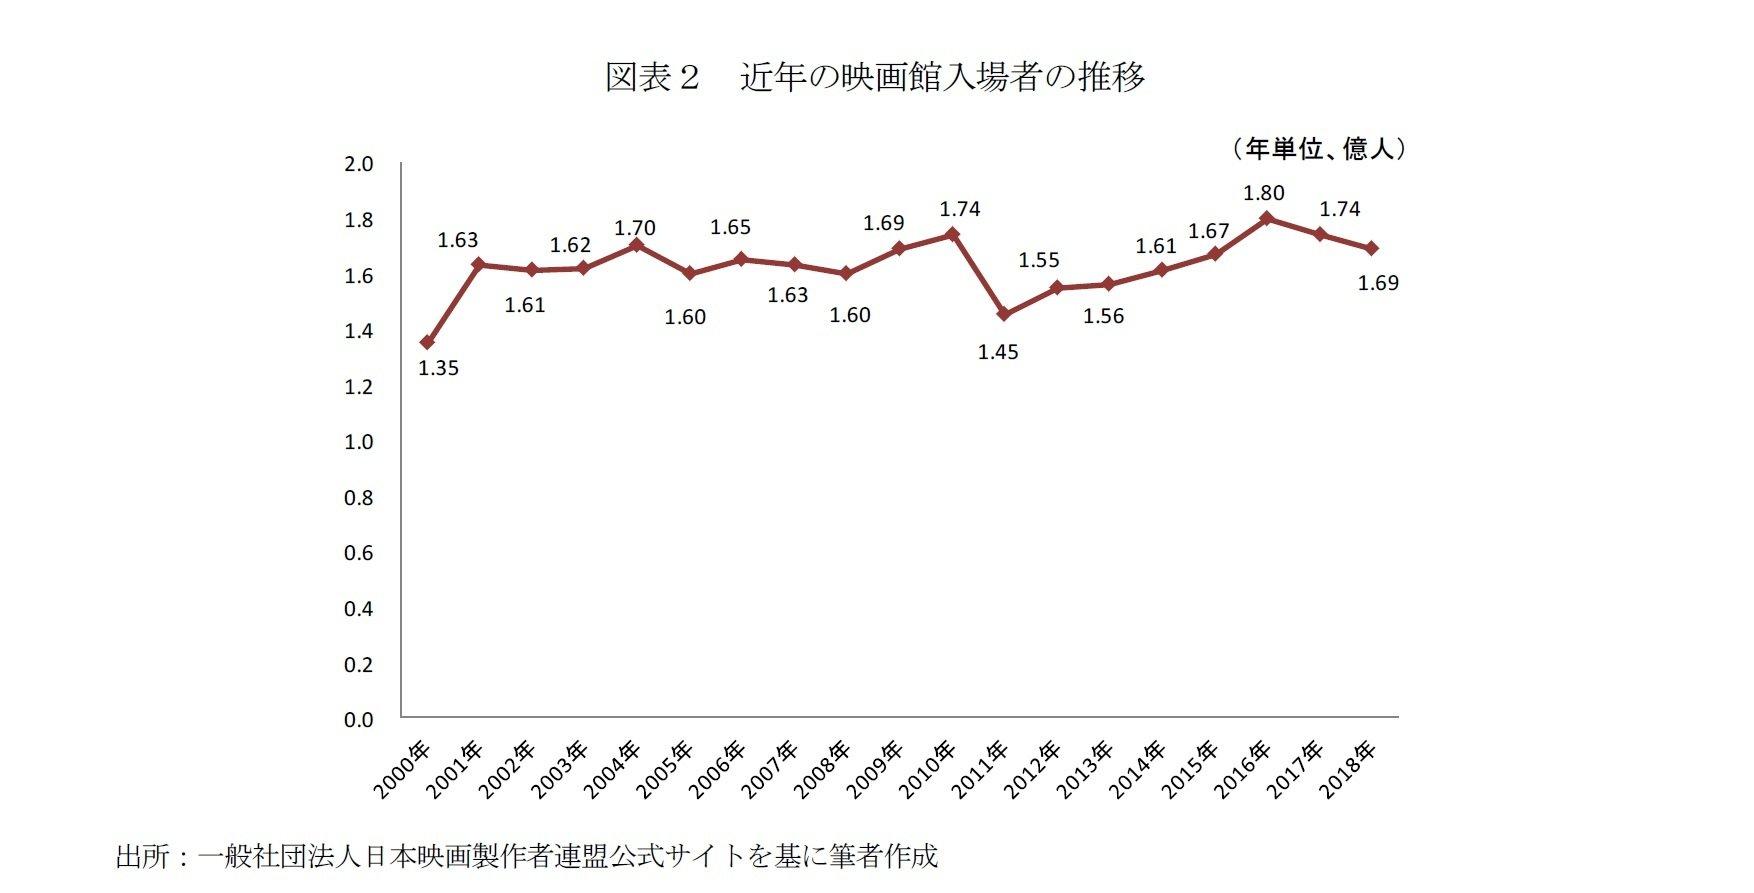 図表2 近年の映画館入場者の推移